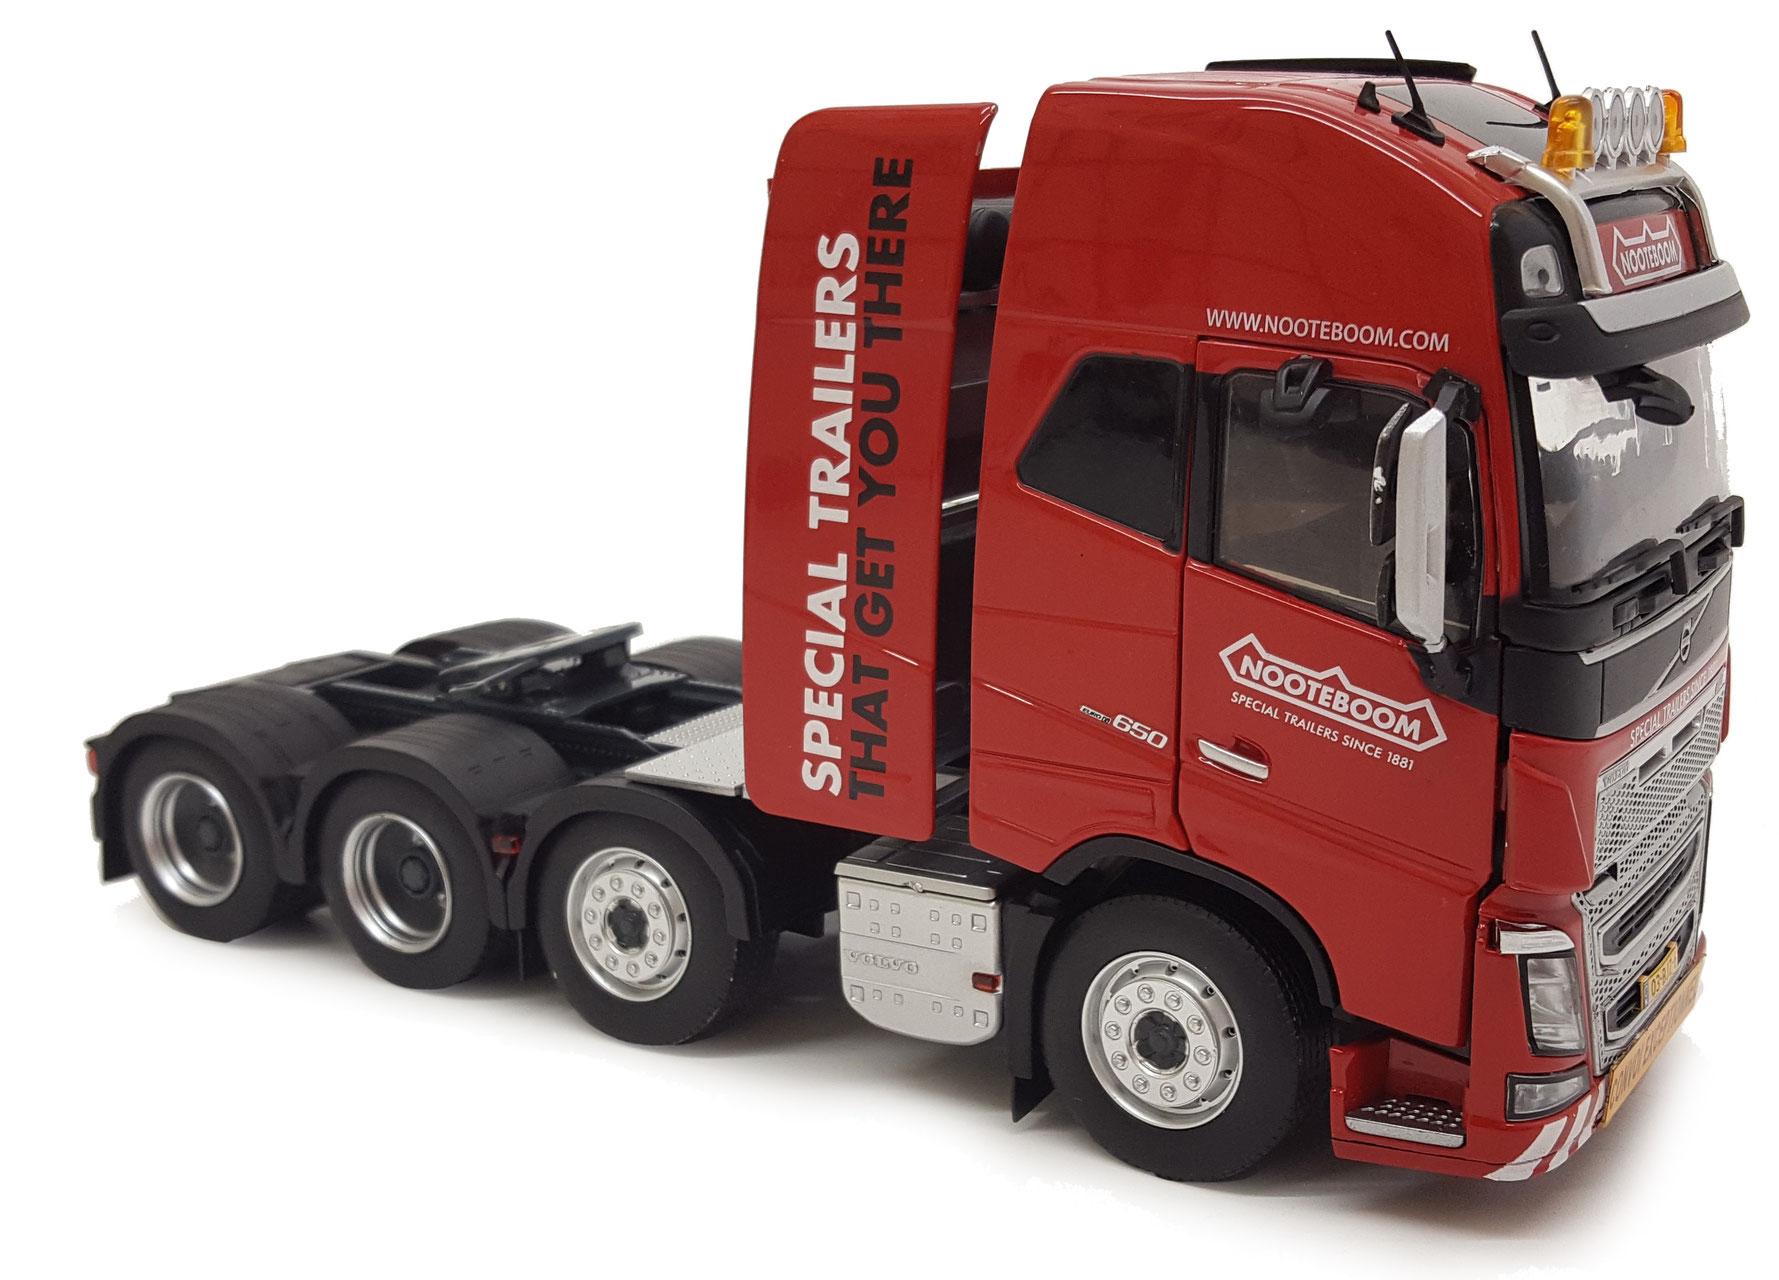 Awm camiones MAN tg-s LX kippsilo-SZ Friderici 59012